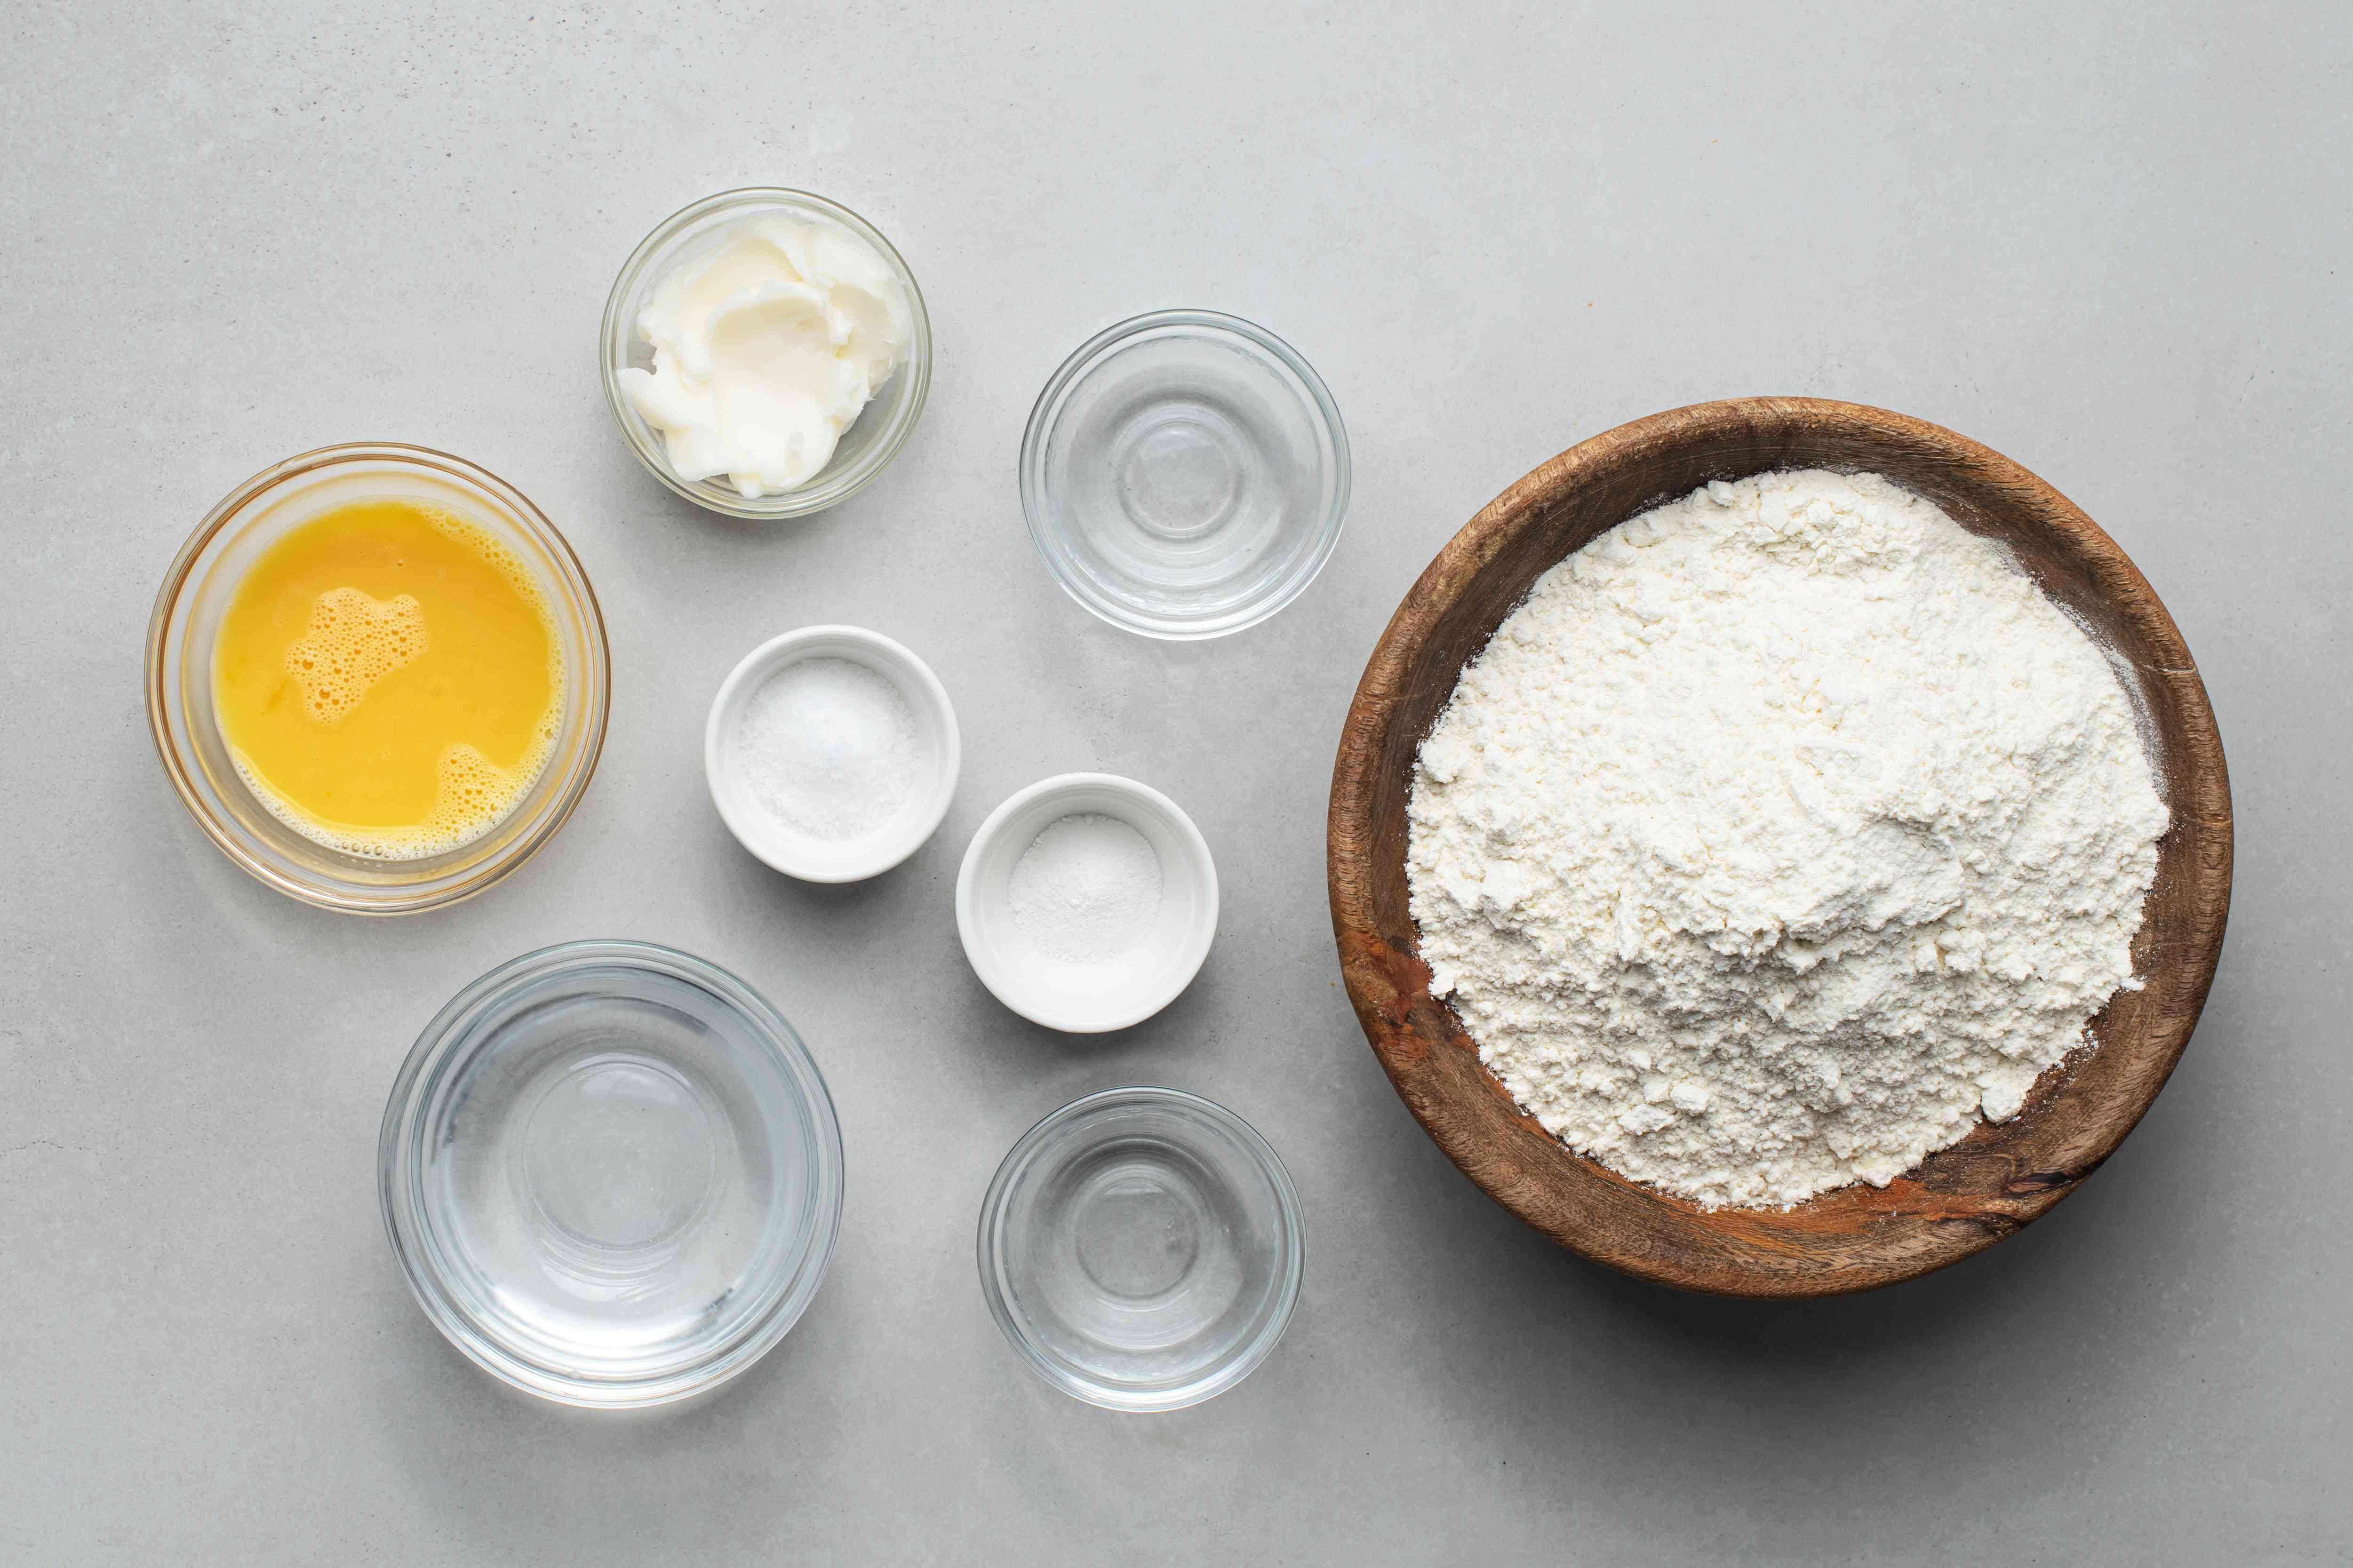 Pastry dough ingredients